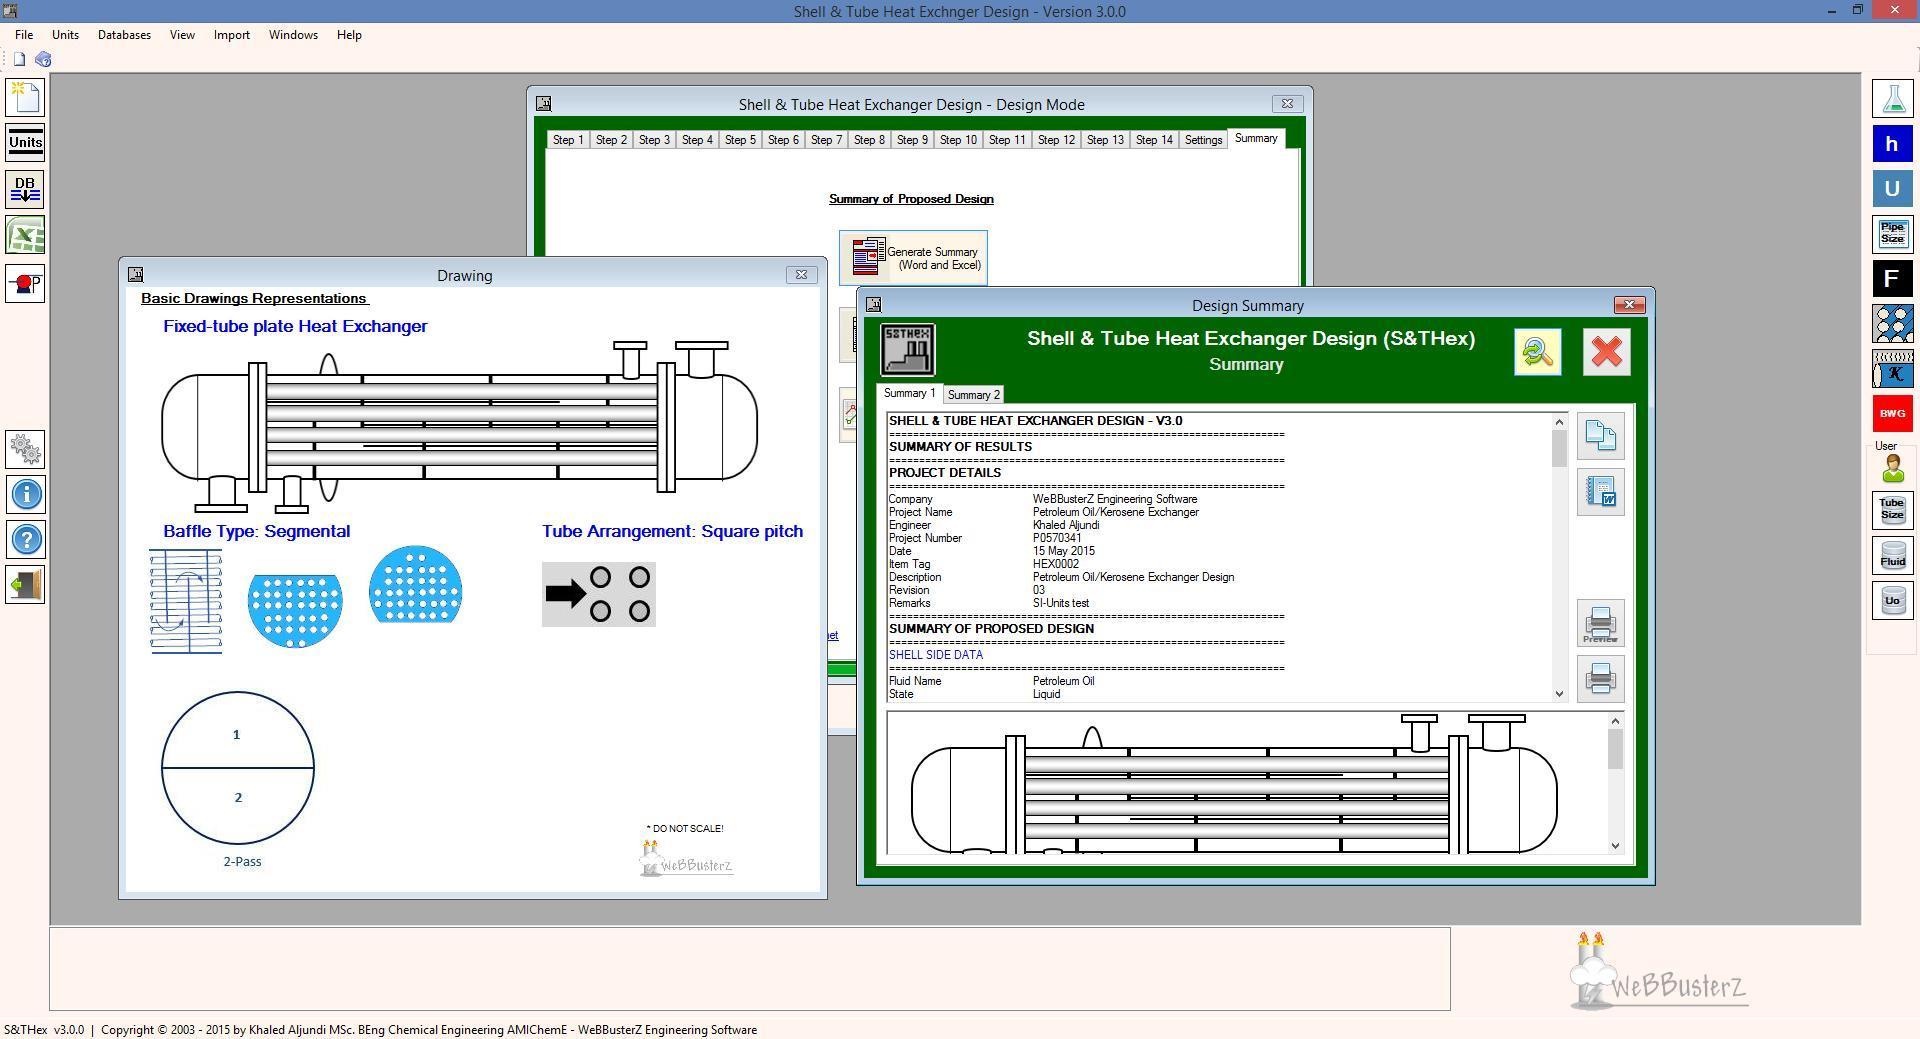 Datenkommunikation mit dem PC: Ein Turbo Pascal Programm